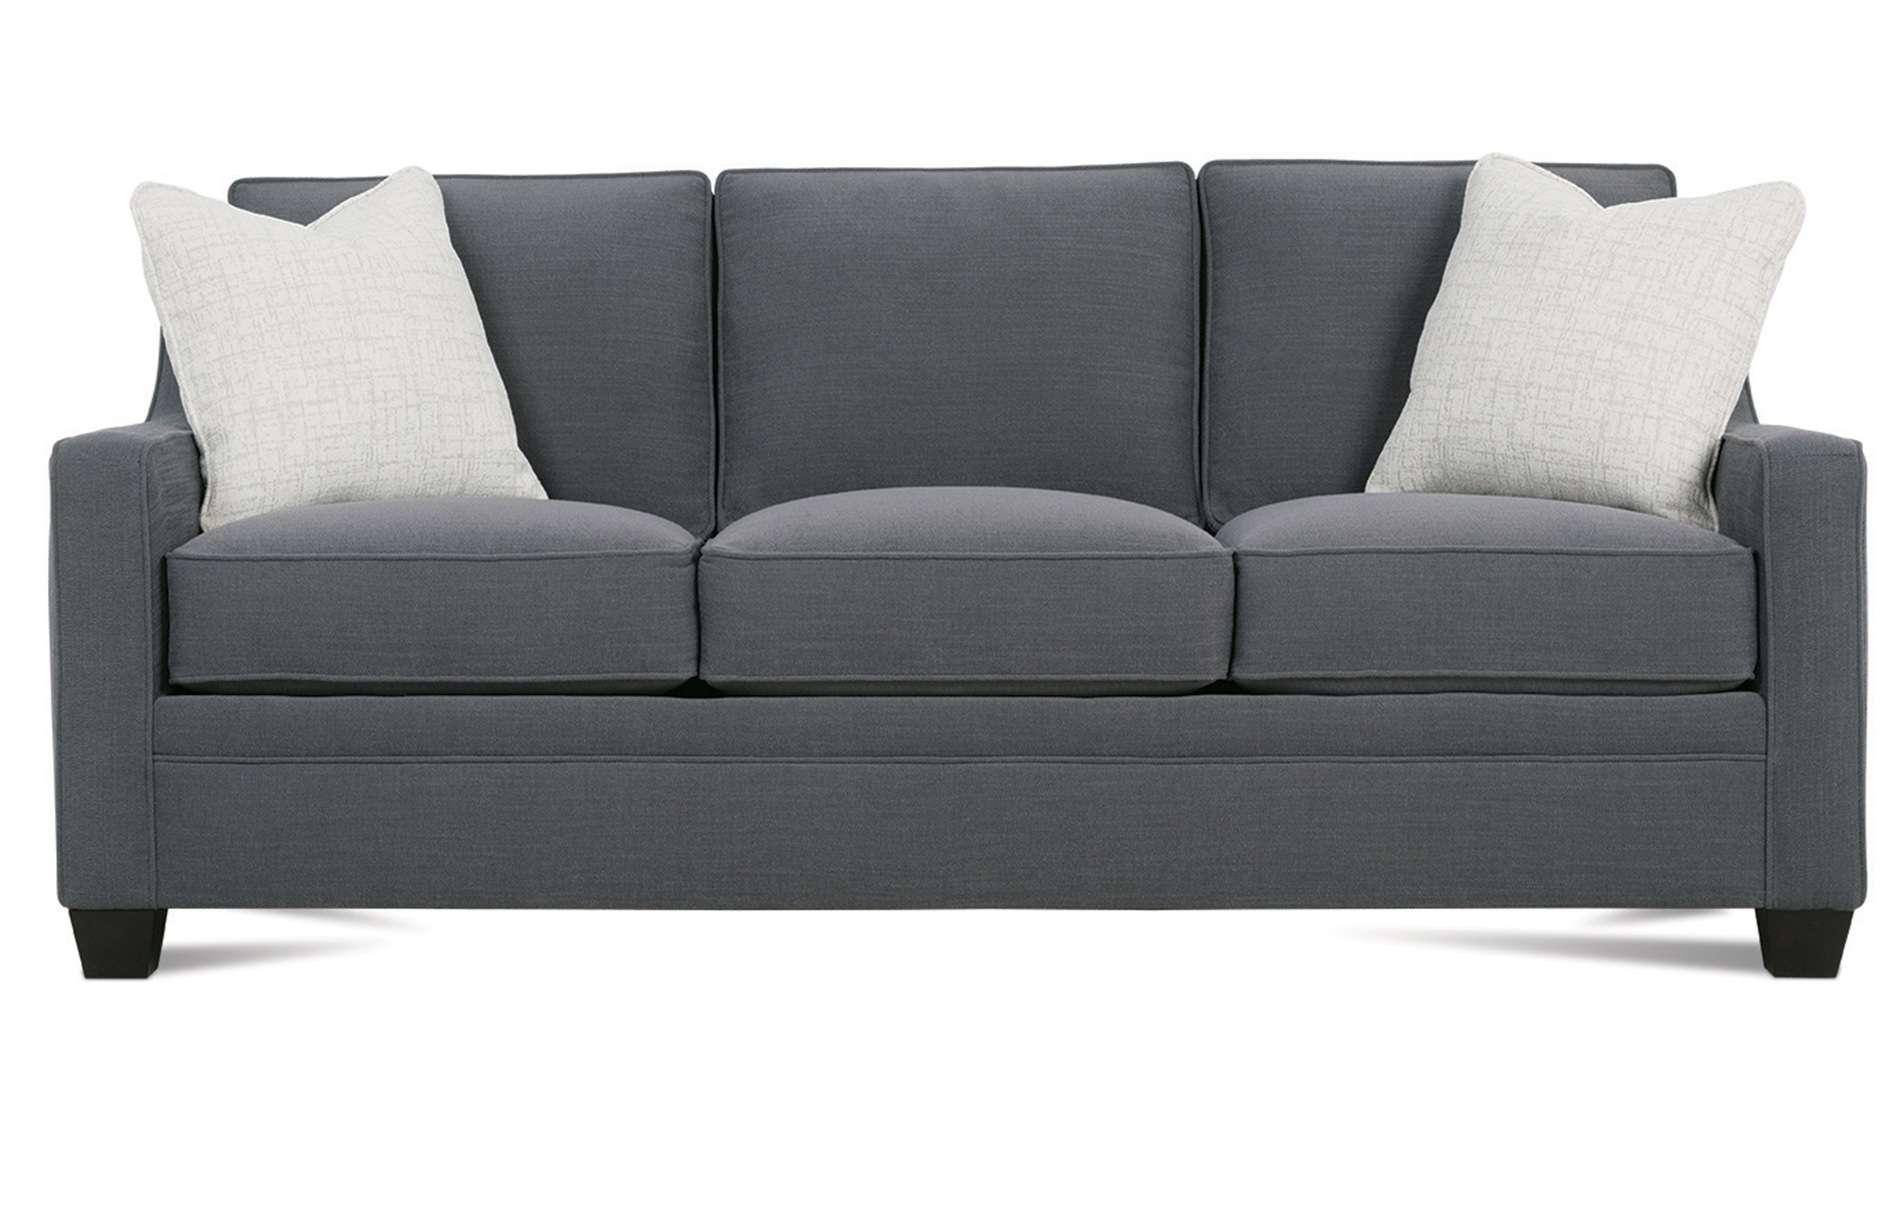 Replacement air mattress for sofa bed - Fuller Full Sleeper